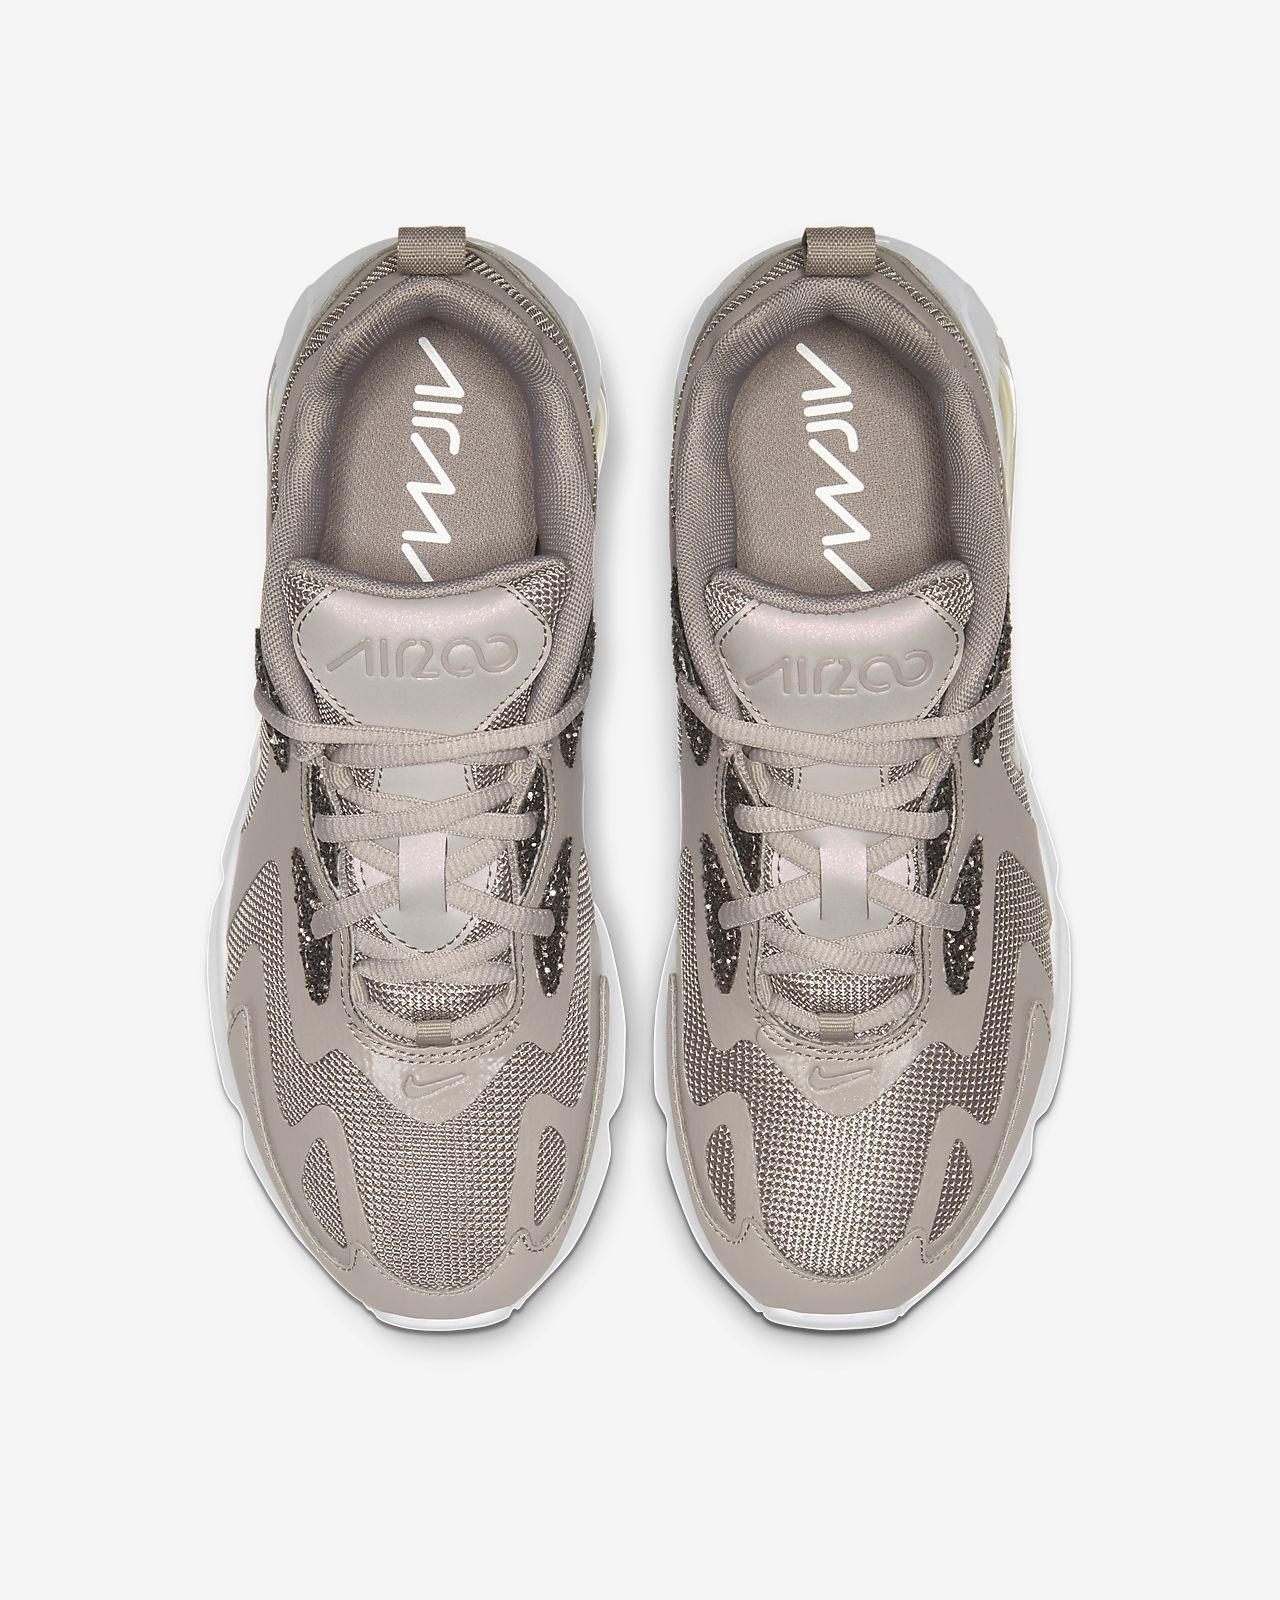 Nike Air Max 200 schimmernder Damenschuh